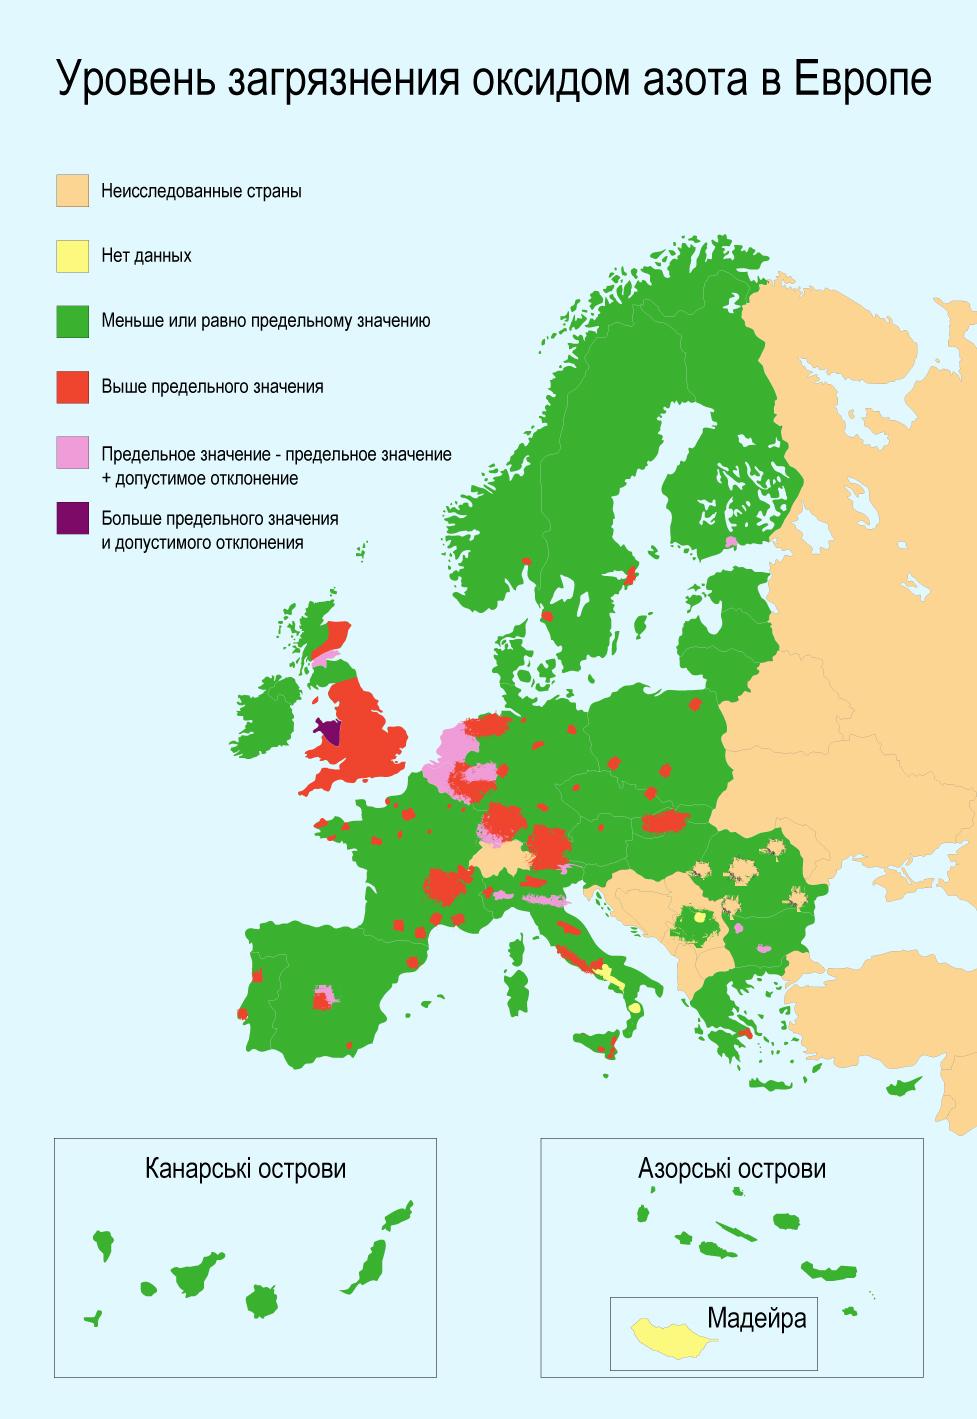 Загрязнение азотом в Европе